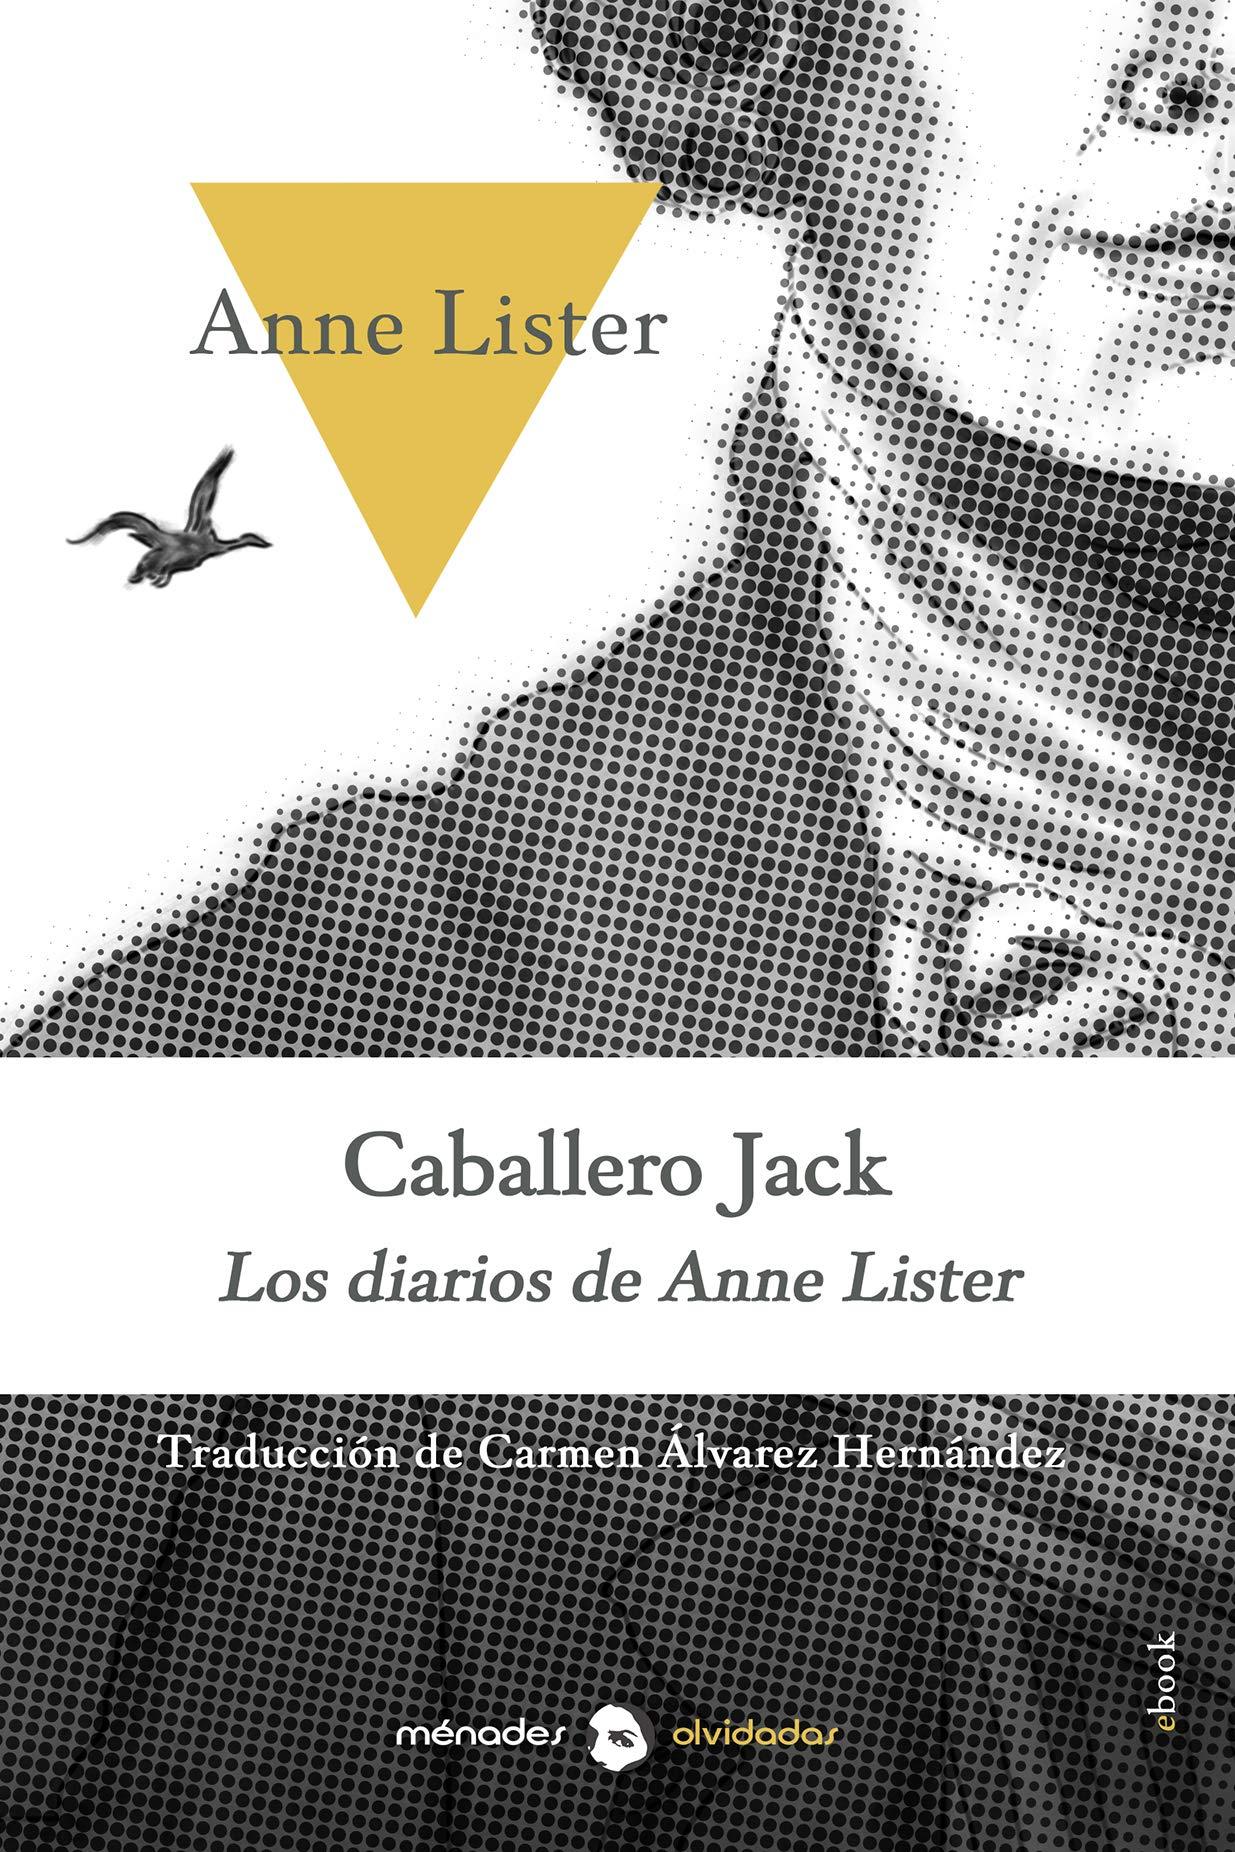 Caballero Jack: Los diarios de Anne Lister